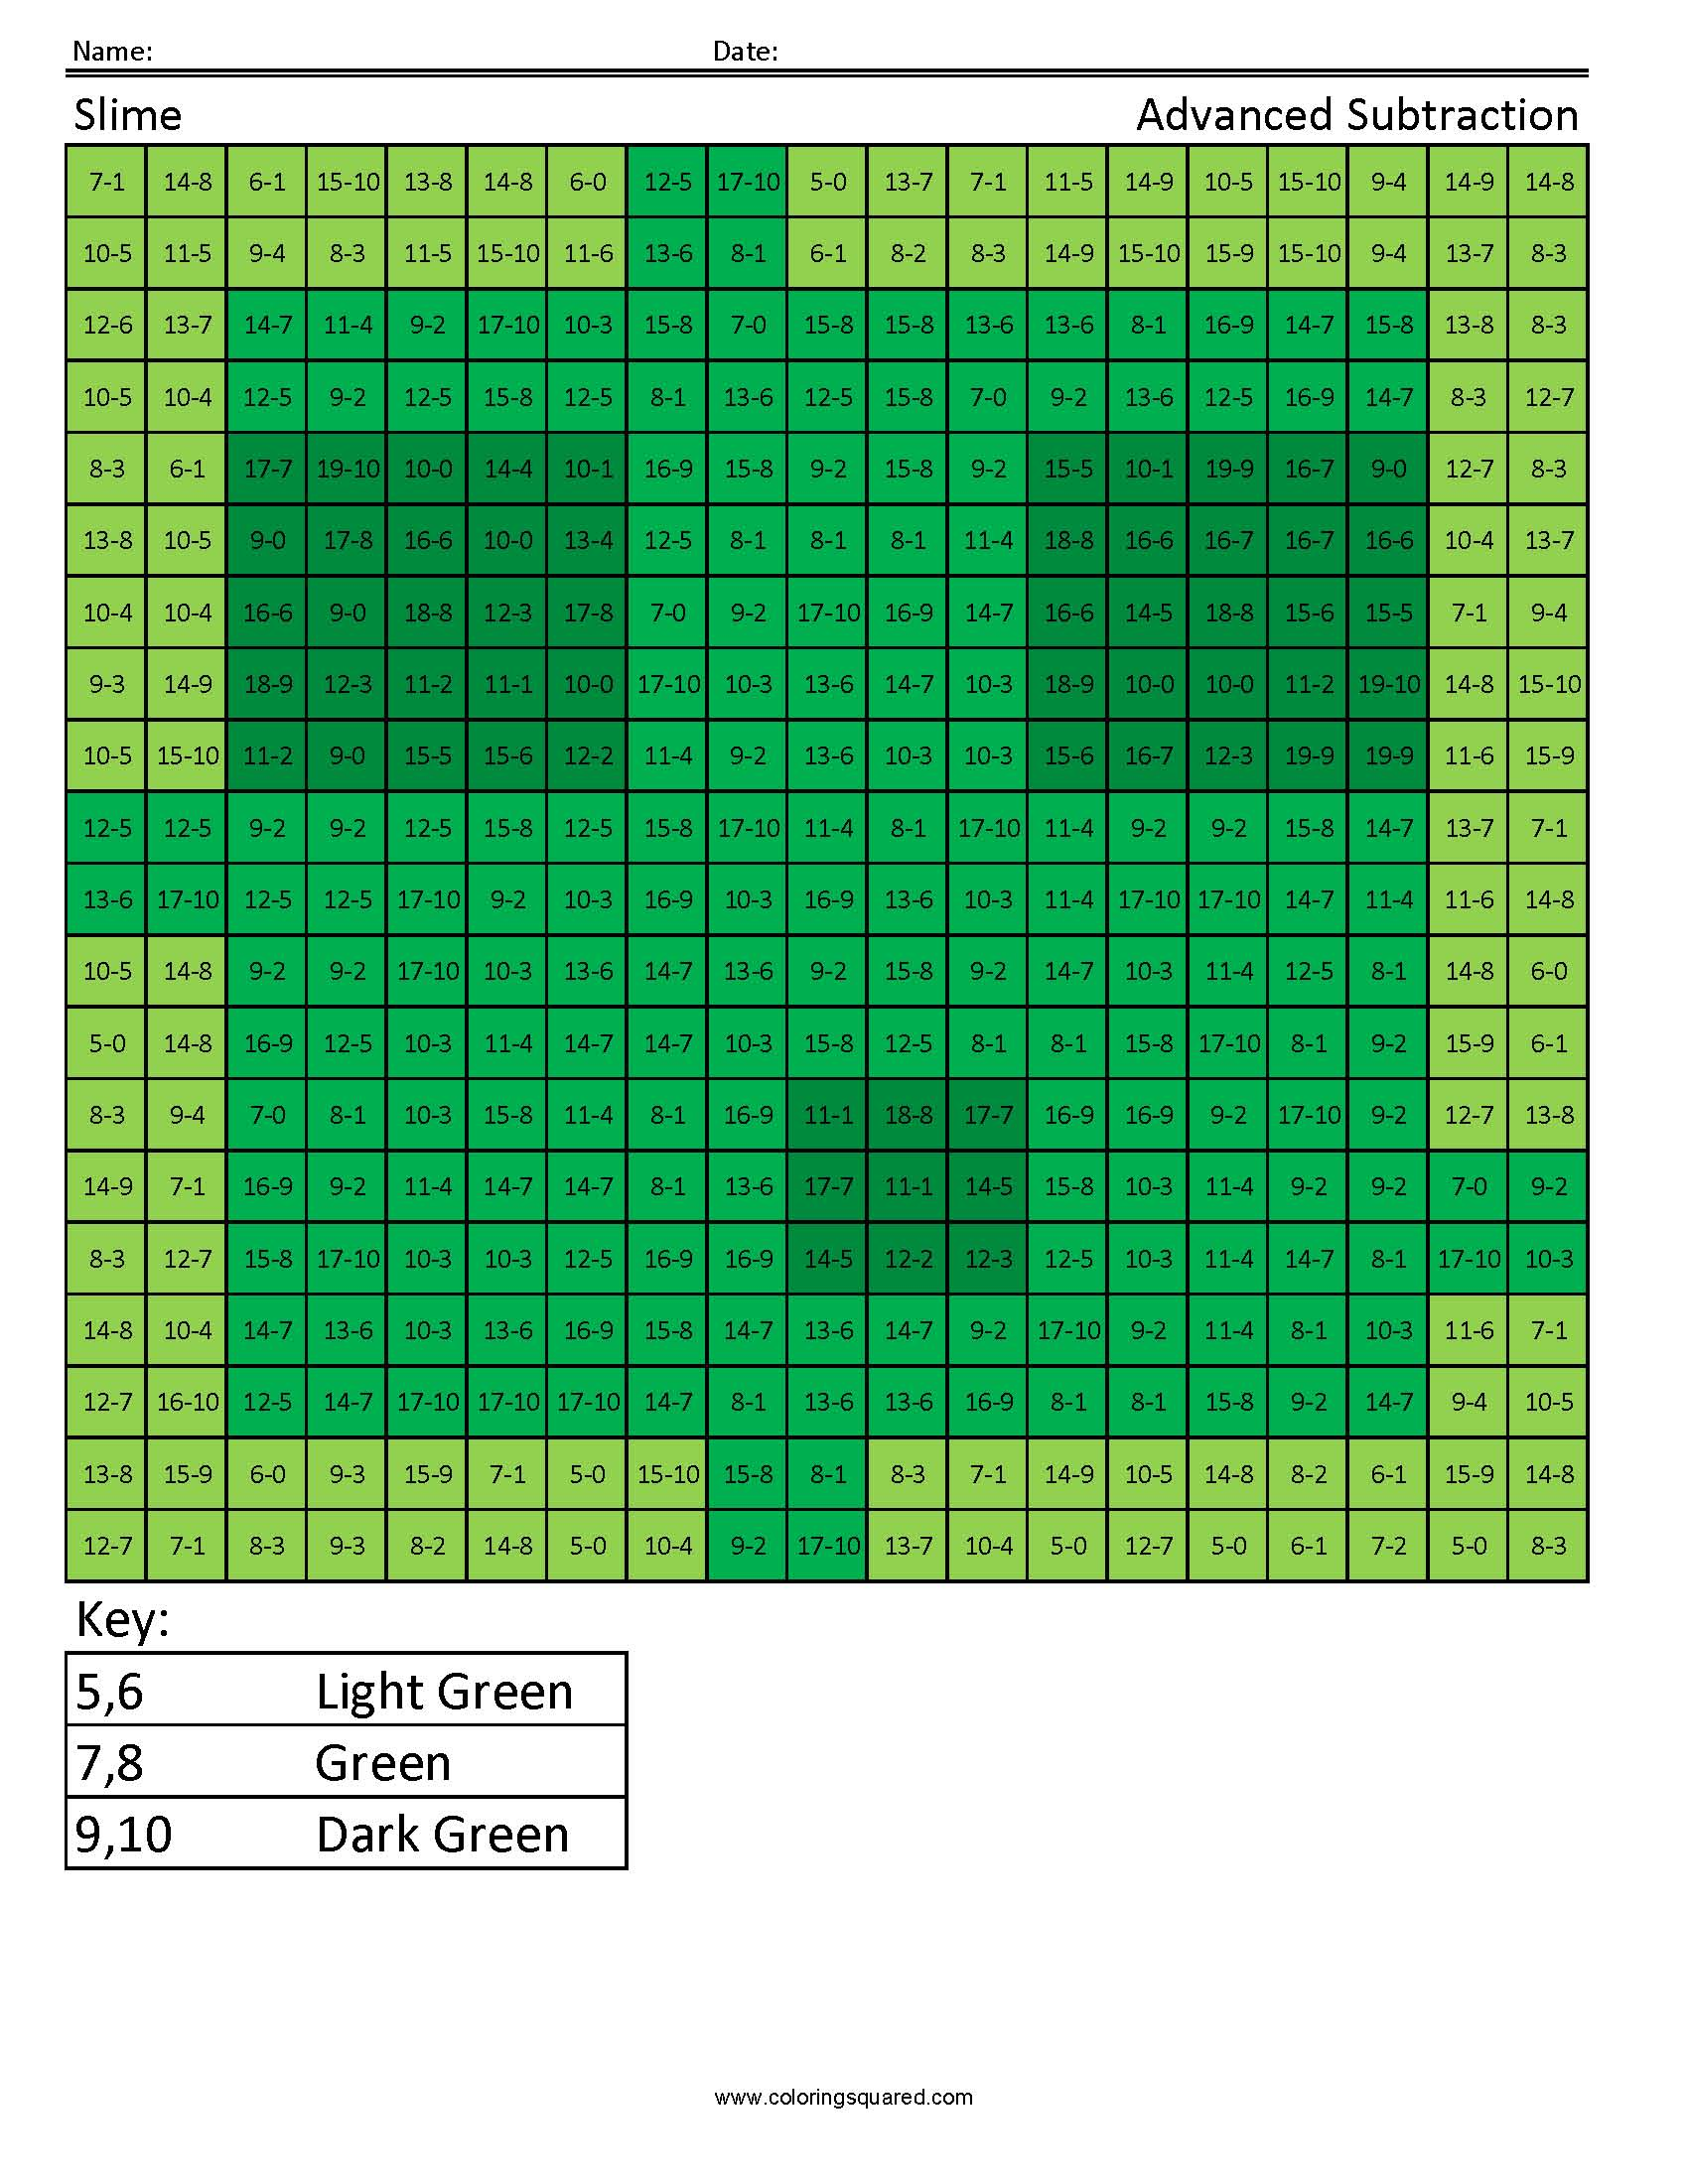 Slime Advanced Subtraction